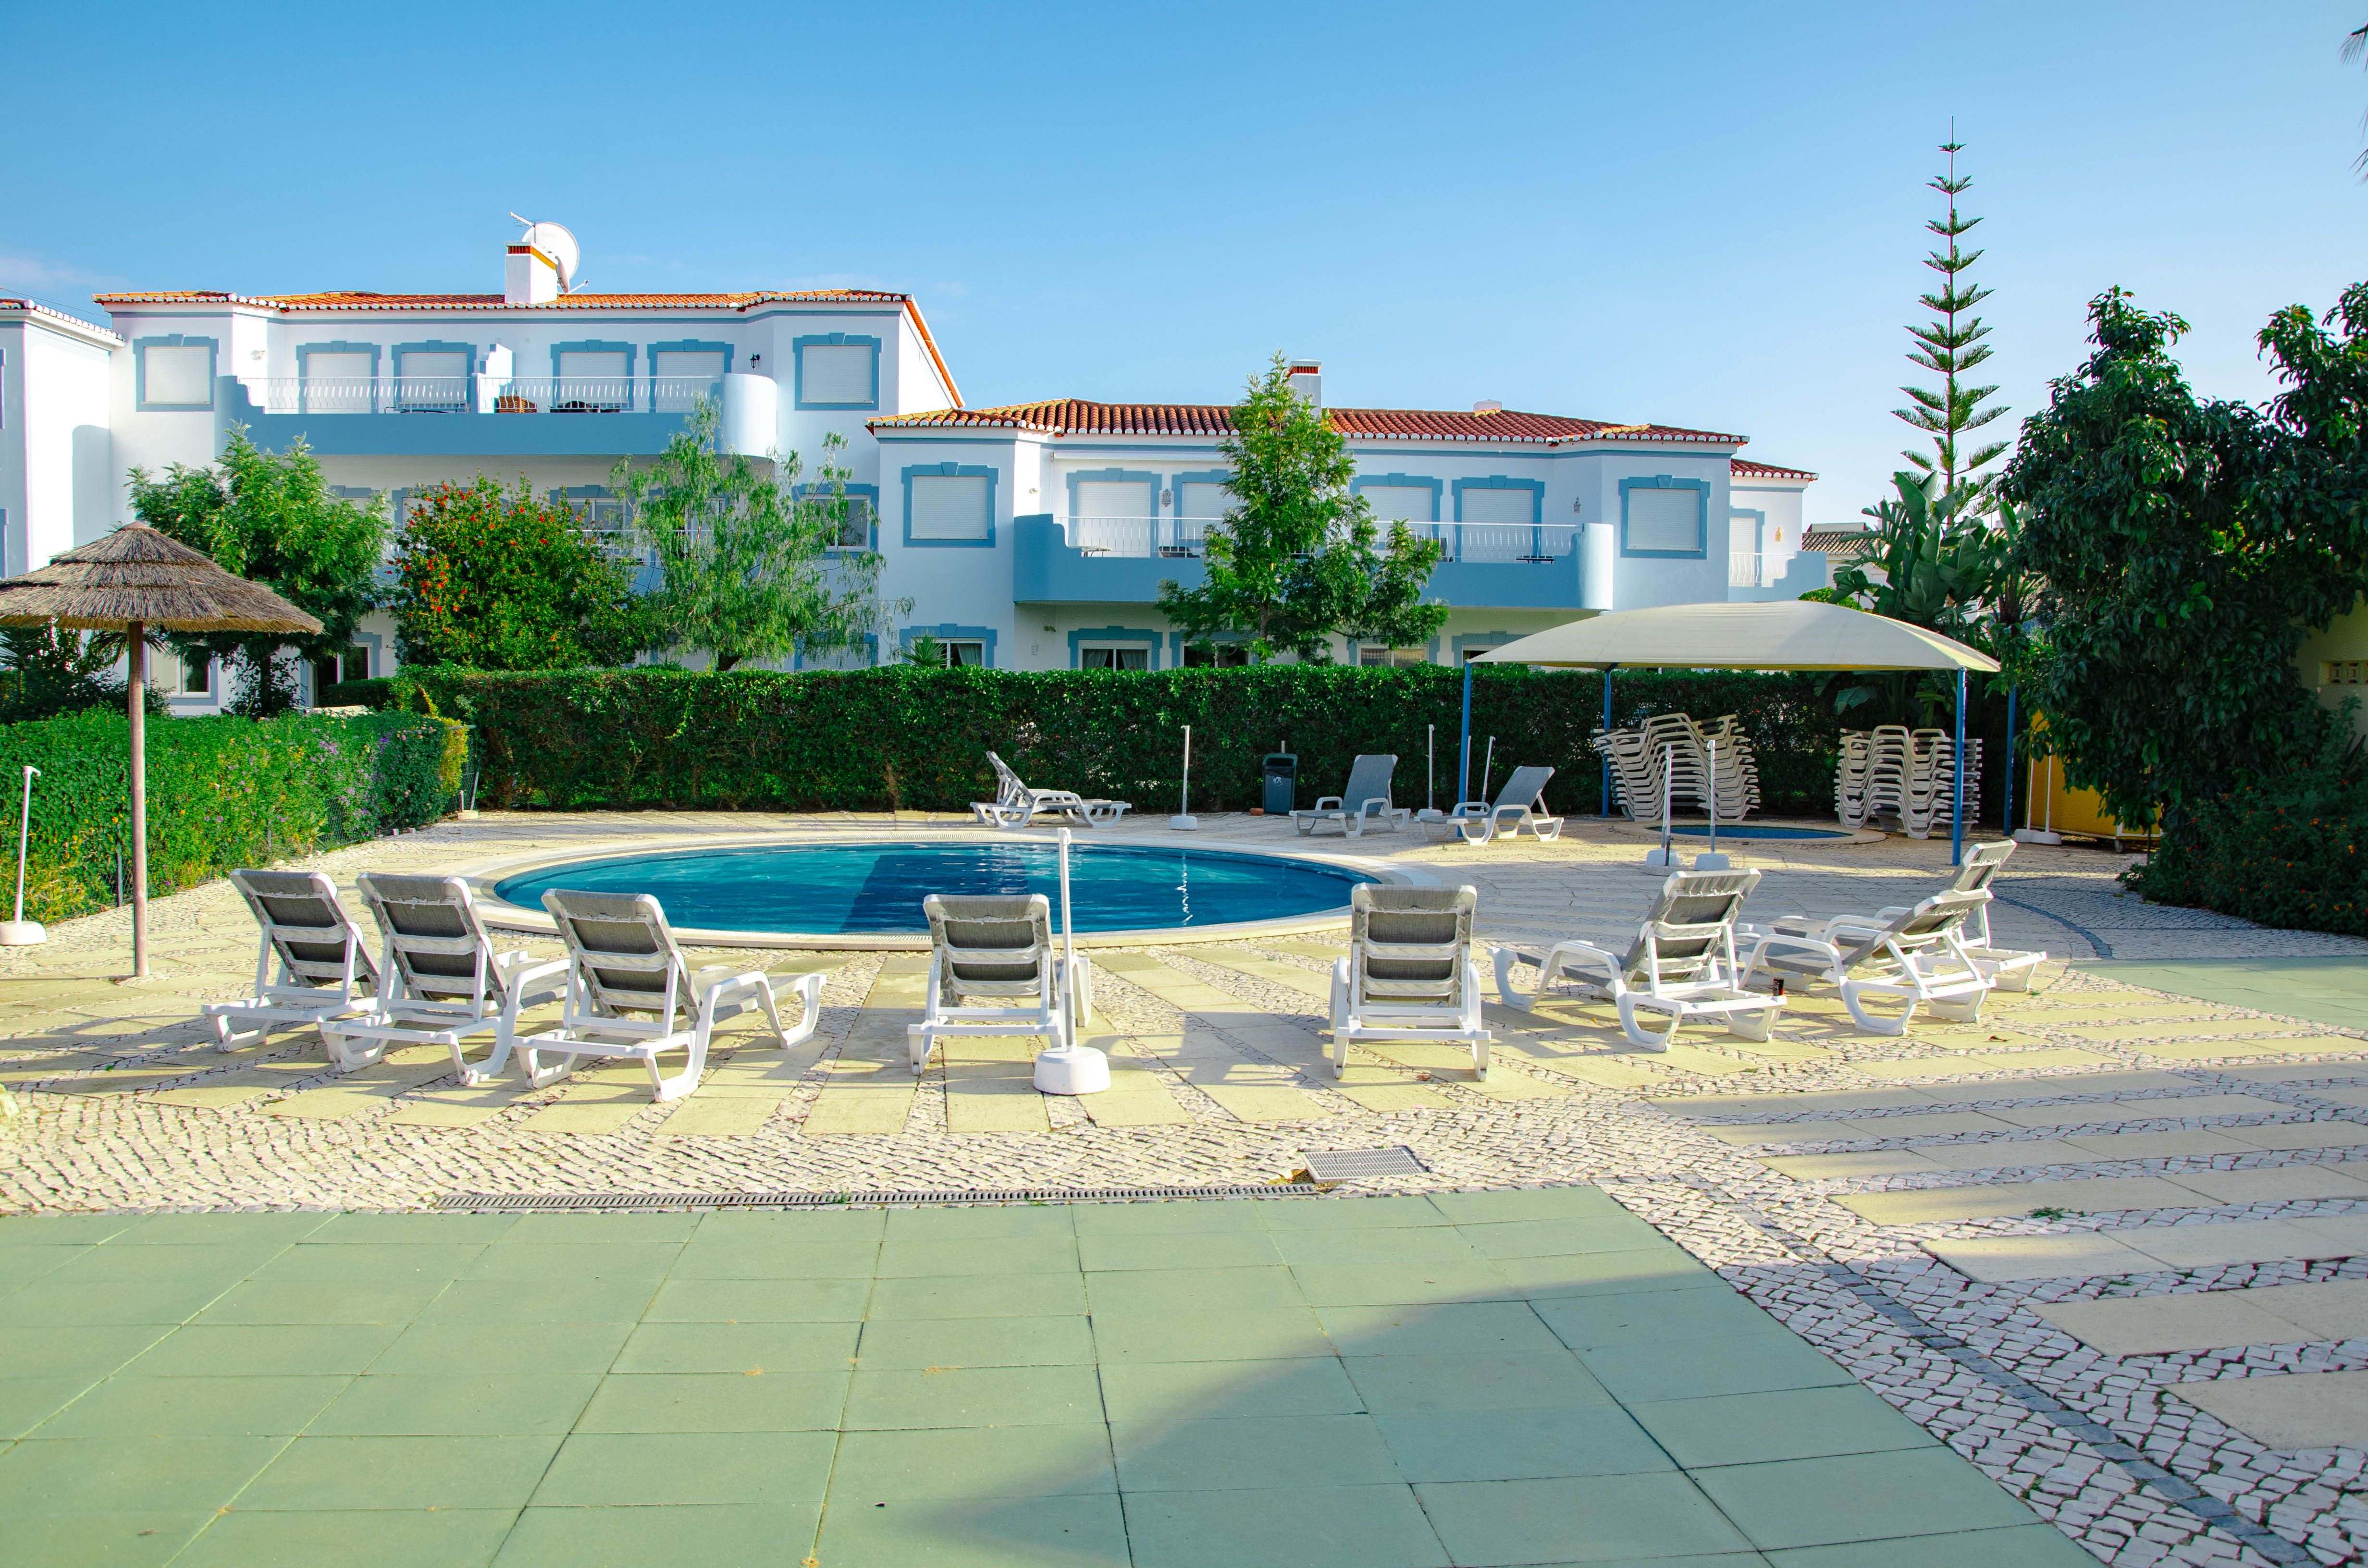 Oasis Parque kids pool